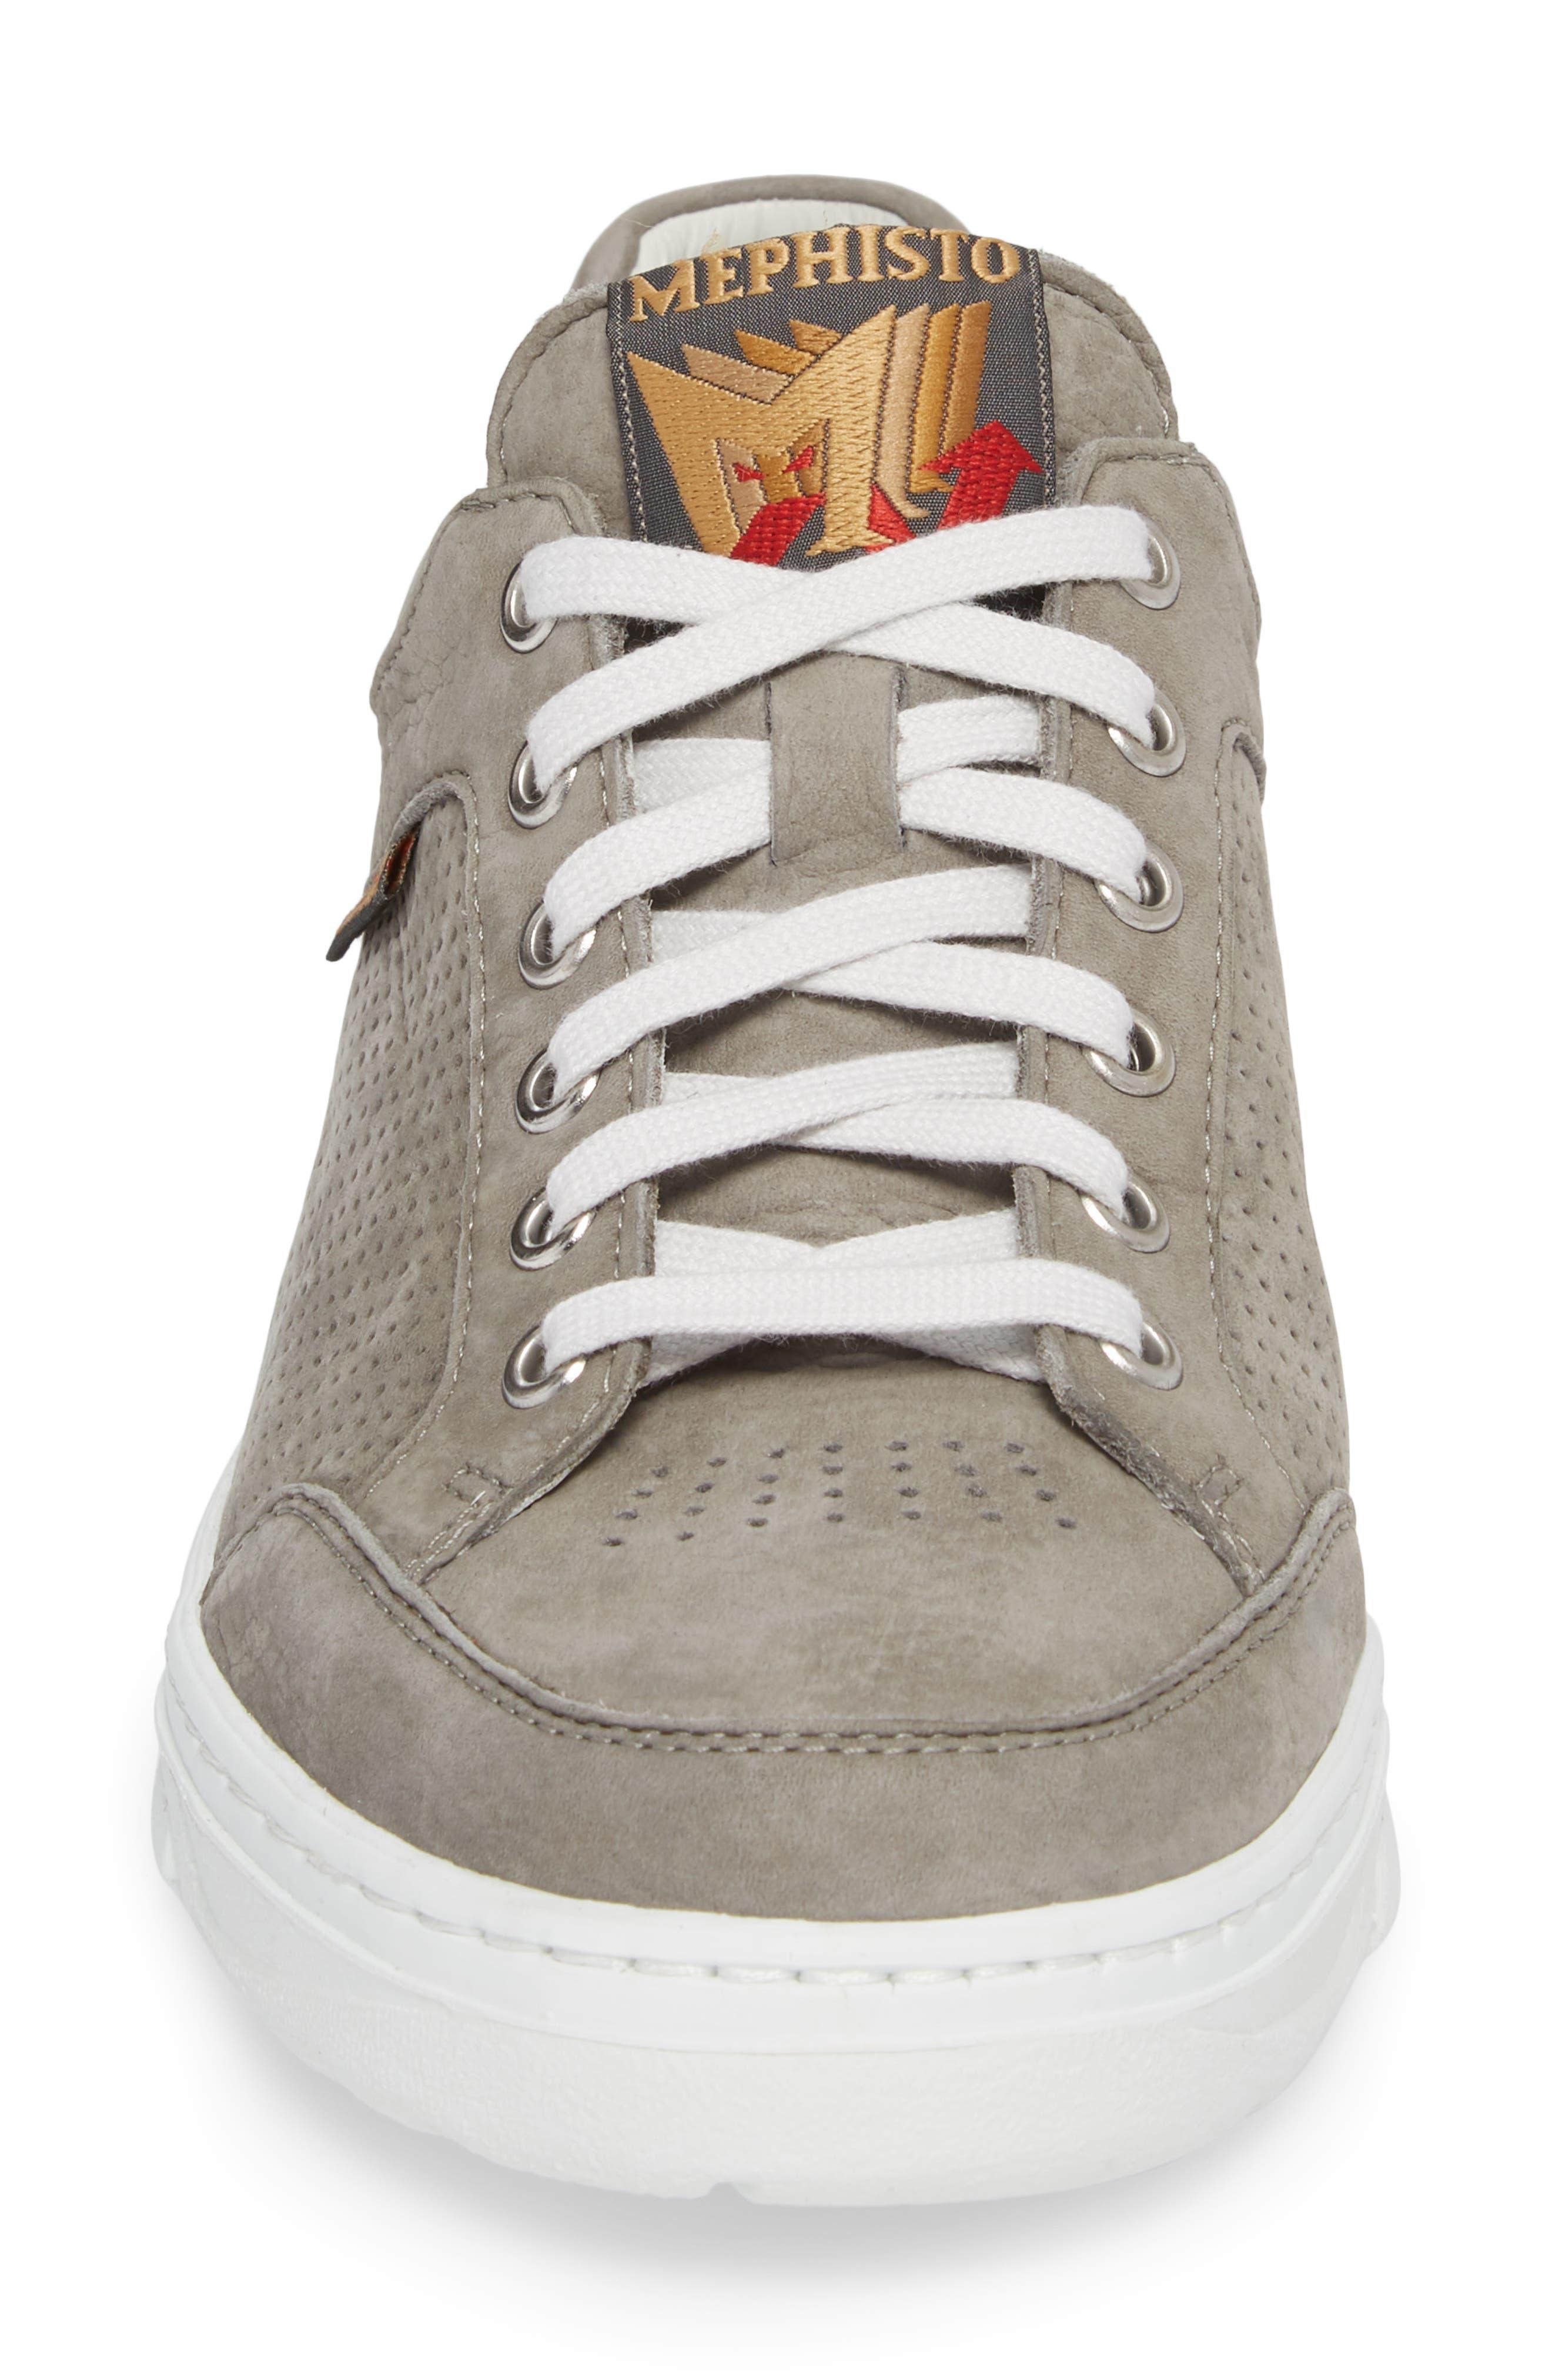 Mathias Perforated Sneaker,                             Alternate thumbnail 4, color,                             Light Grey